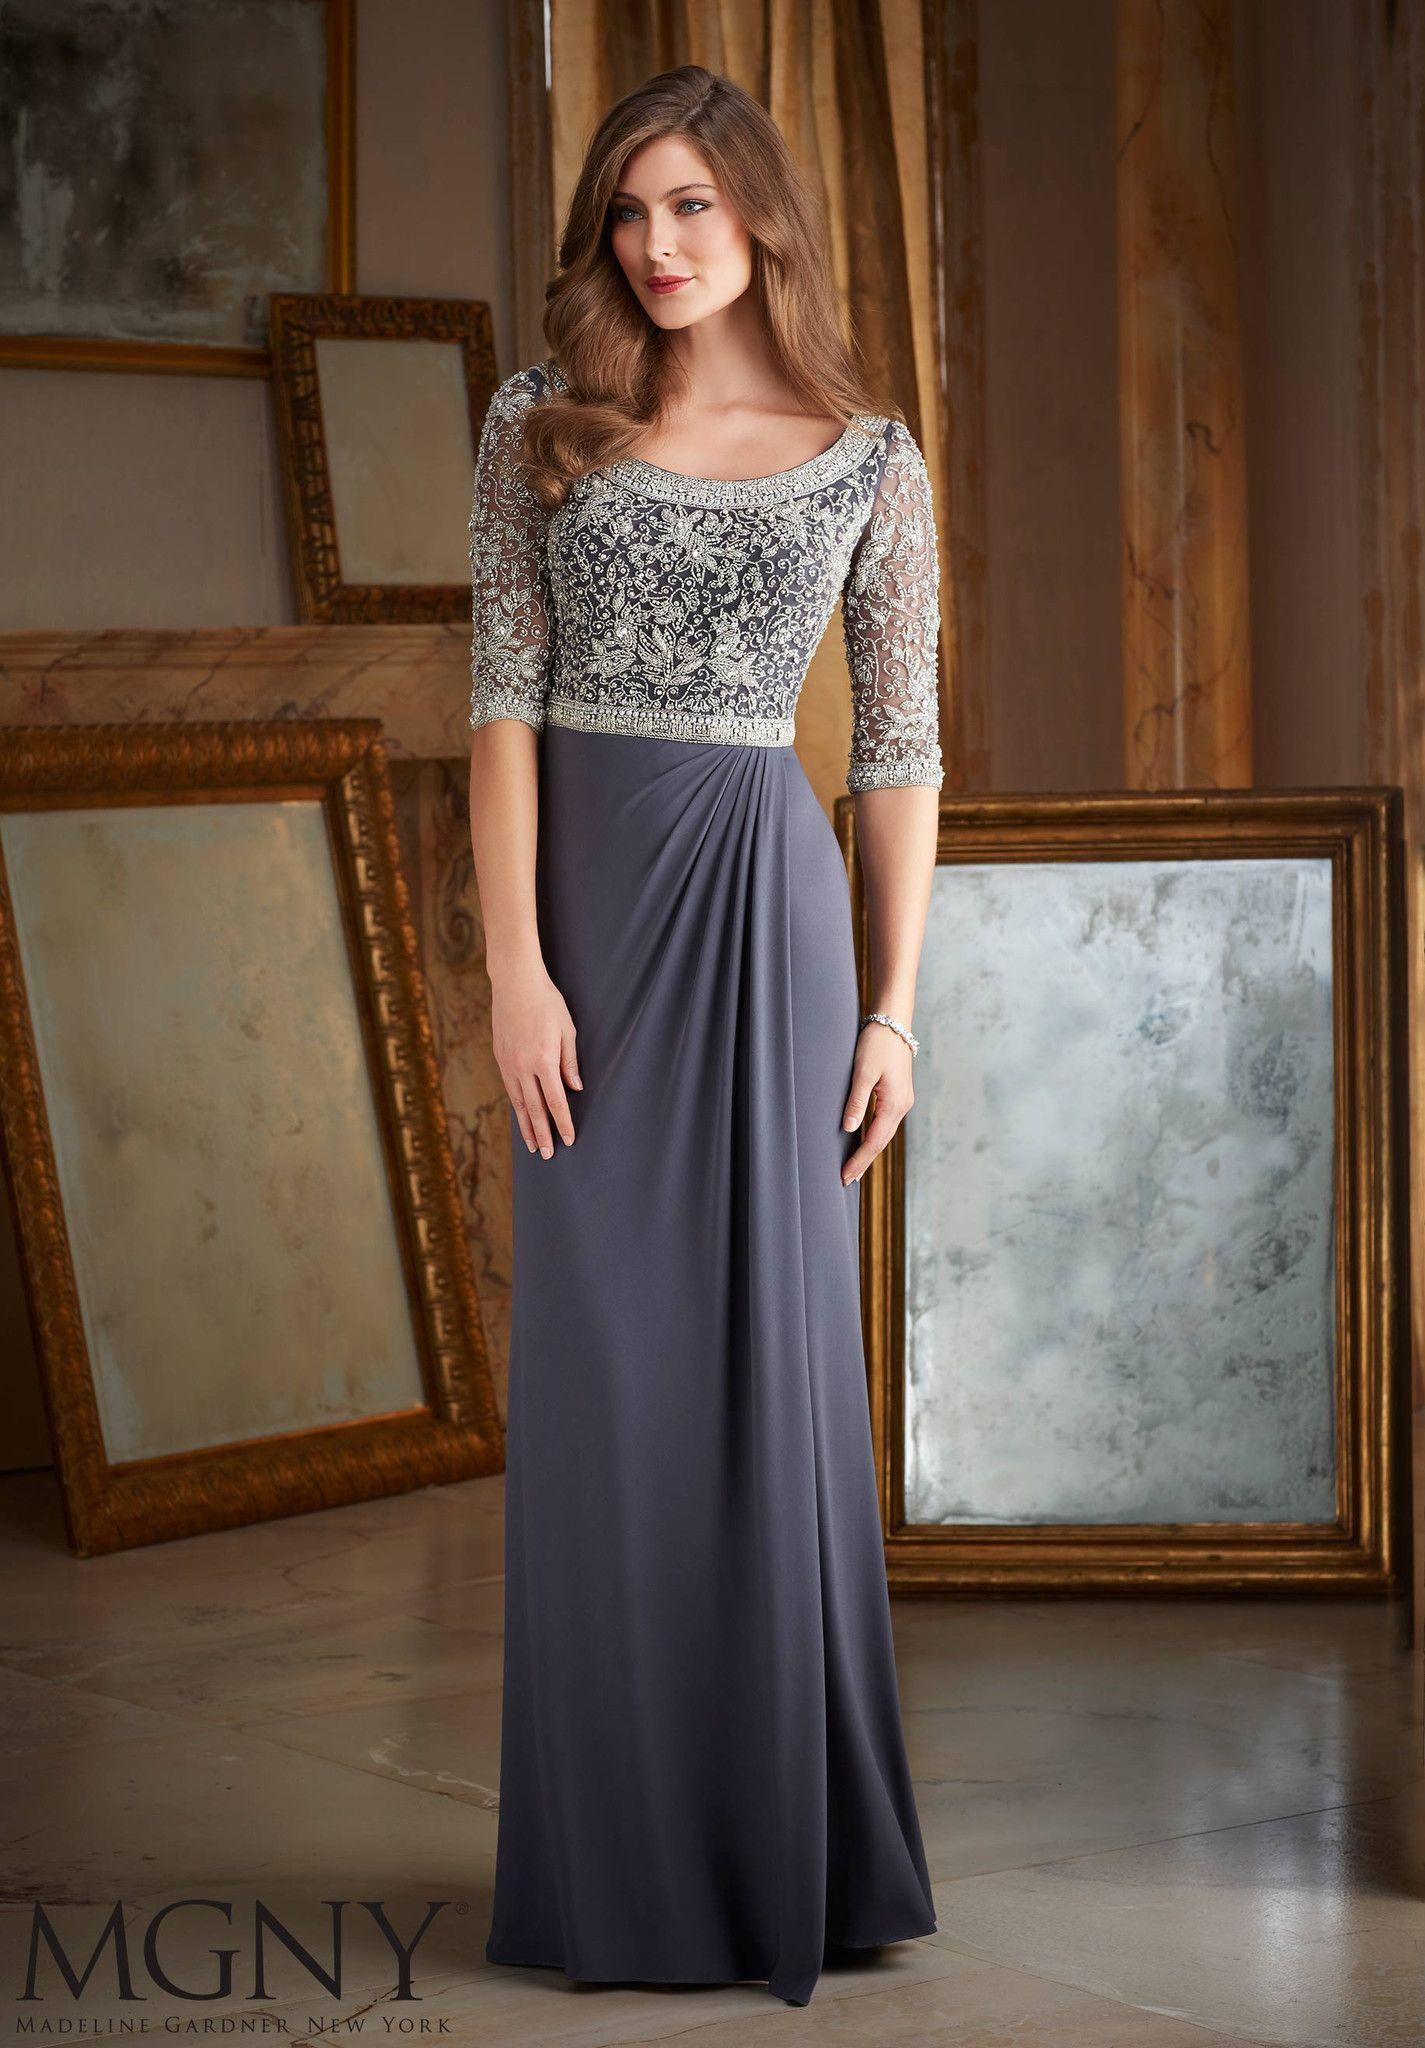 Evening gown plasmakunst pinterest gowns